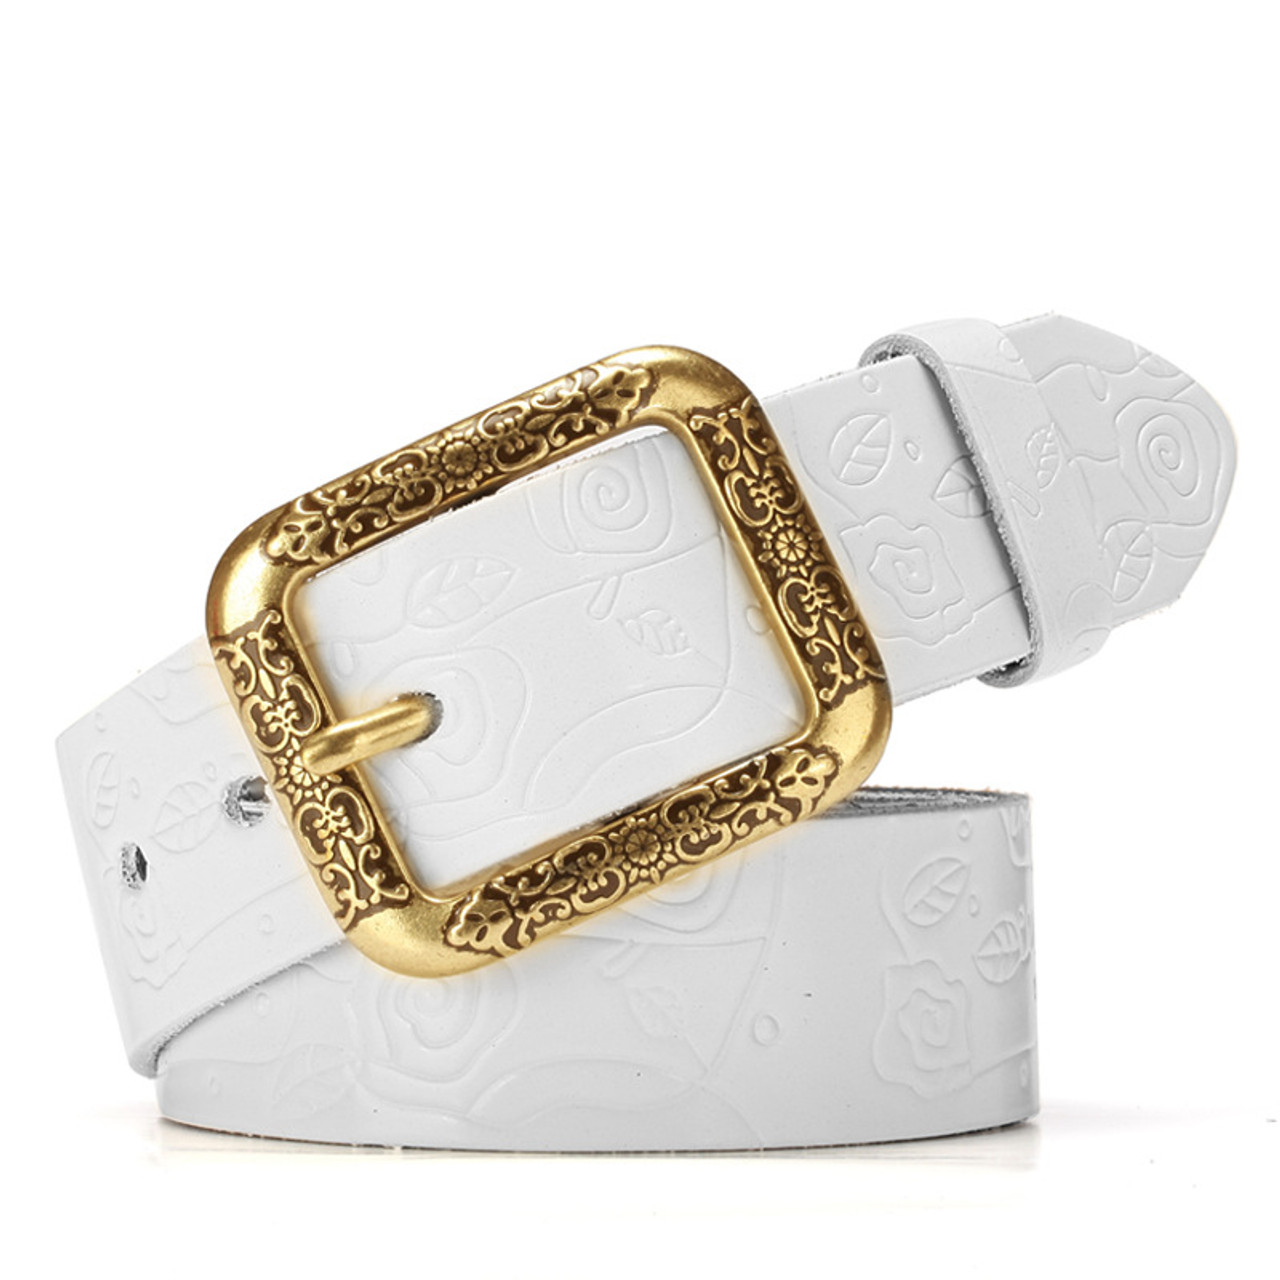 ecc4d45f6 ... 2017 new Designer Brand Women Cow Genuine leather hollow fashion belts  for women female pin buckle ...